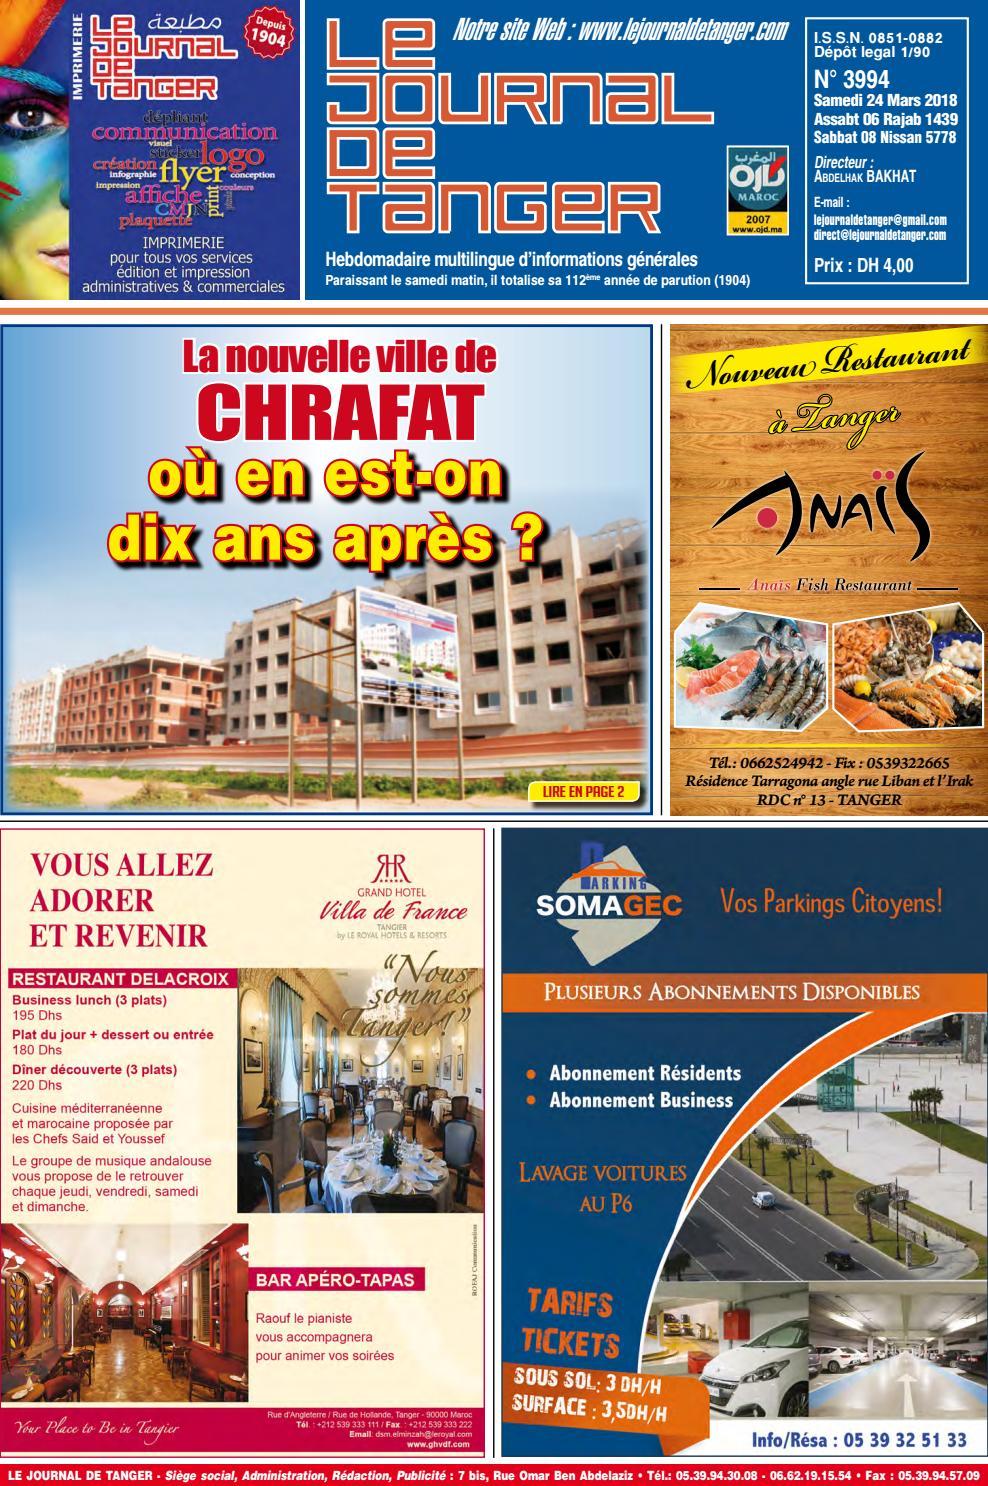 4cf954594 Le journal de Tanger 24 mars 2018 by Le Journal de Tanger - issuu